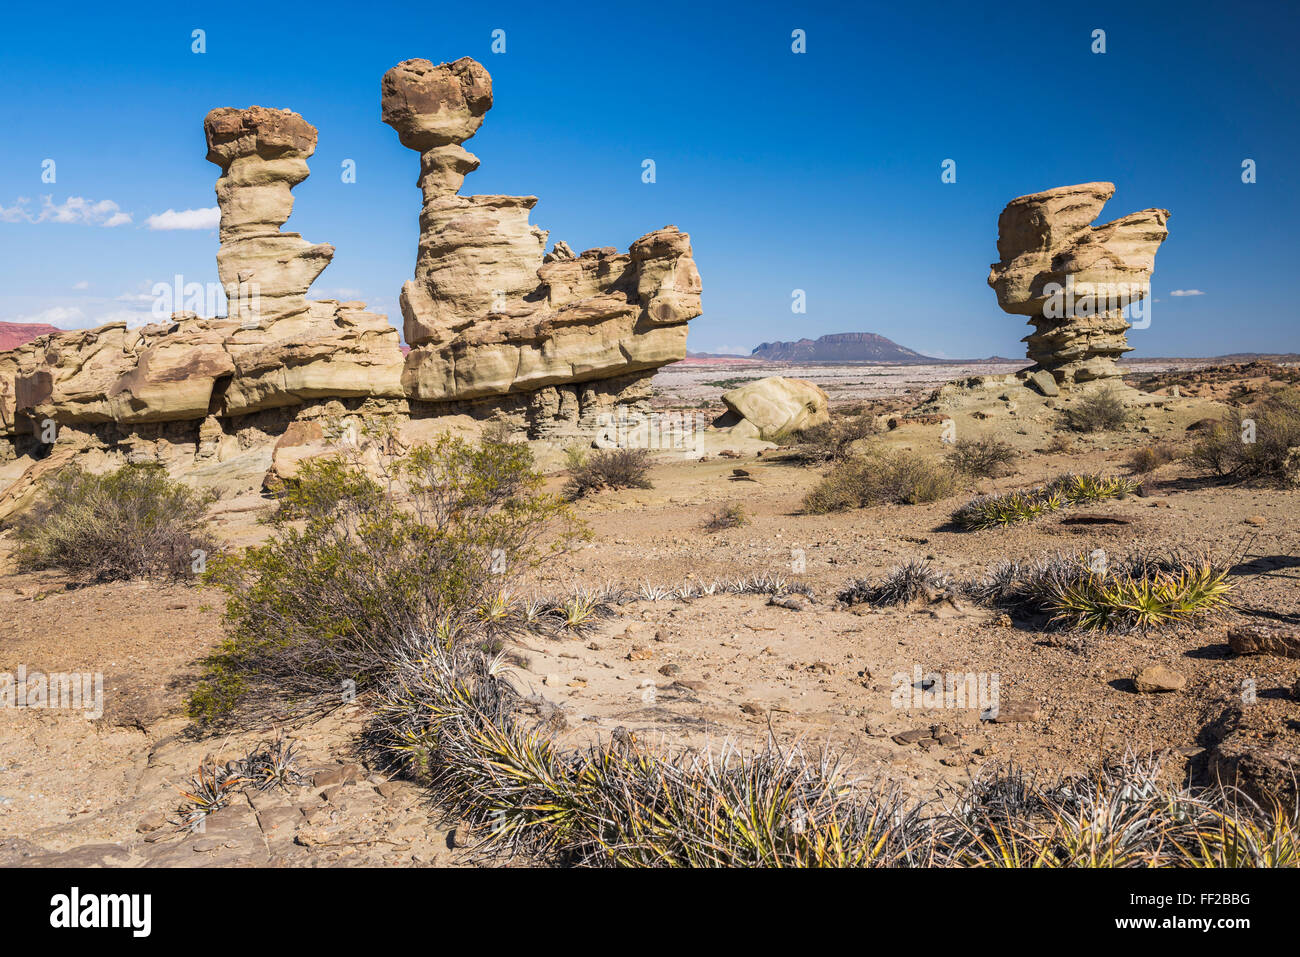 VaRMRMey of the Moon, rock formation known as the Submarine, IschiguaRMasto ProvinciaRM Park, San Juan Province, - Stock Image